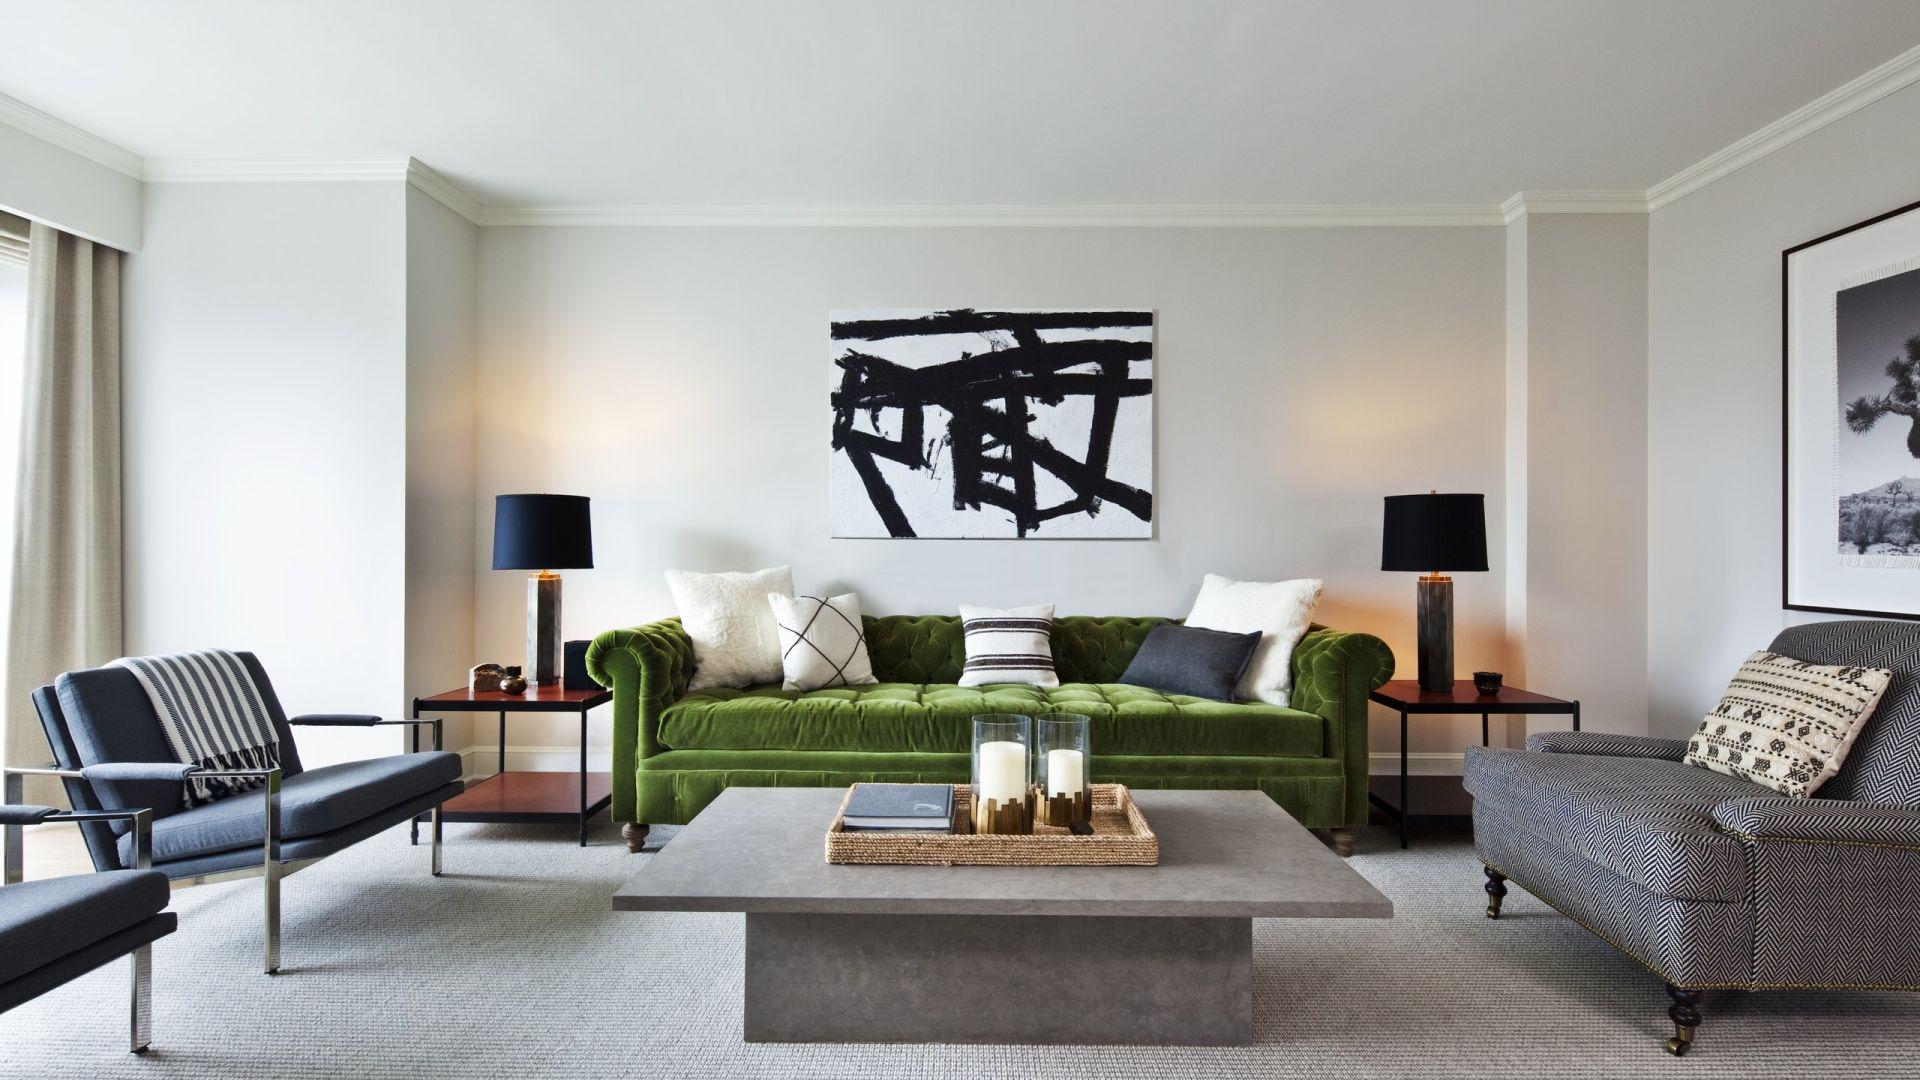 Área de estar da suíte Apartamento Nate Berkus Park Avenue | Loews Regency New York Hotel